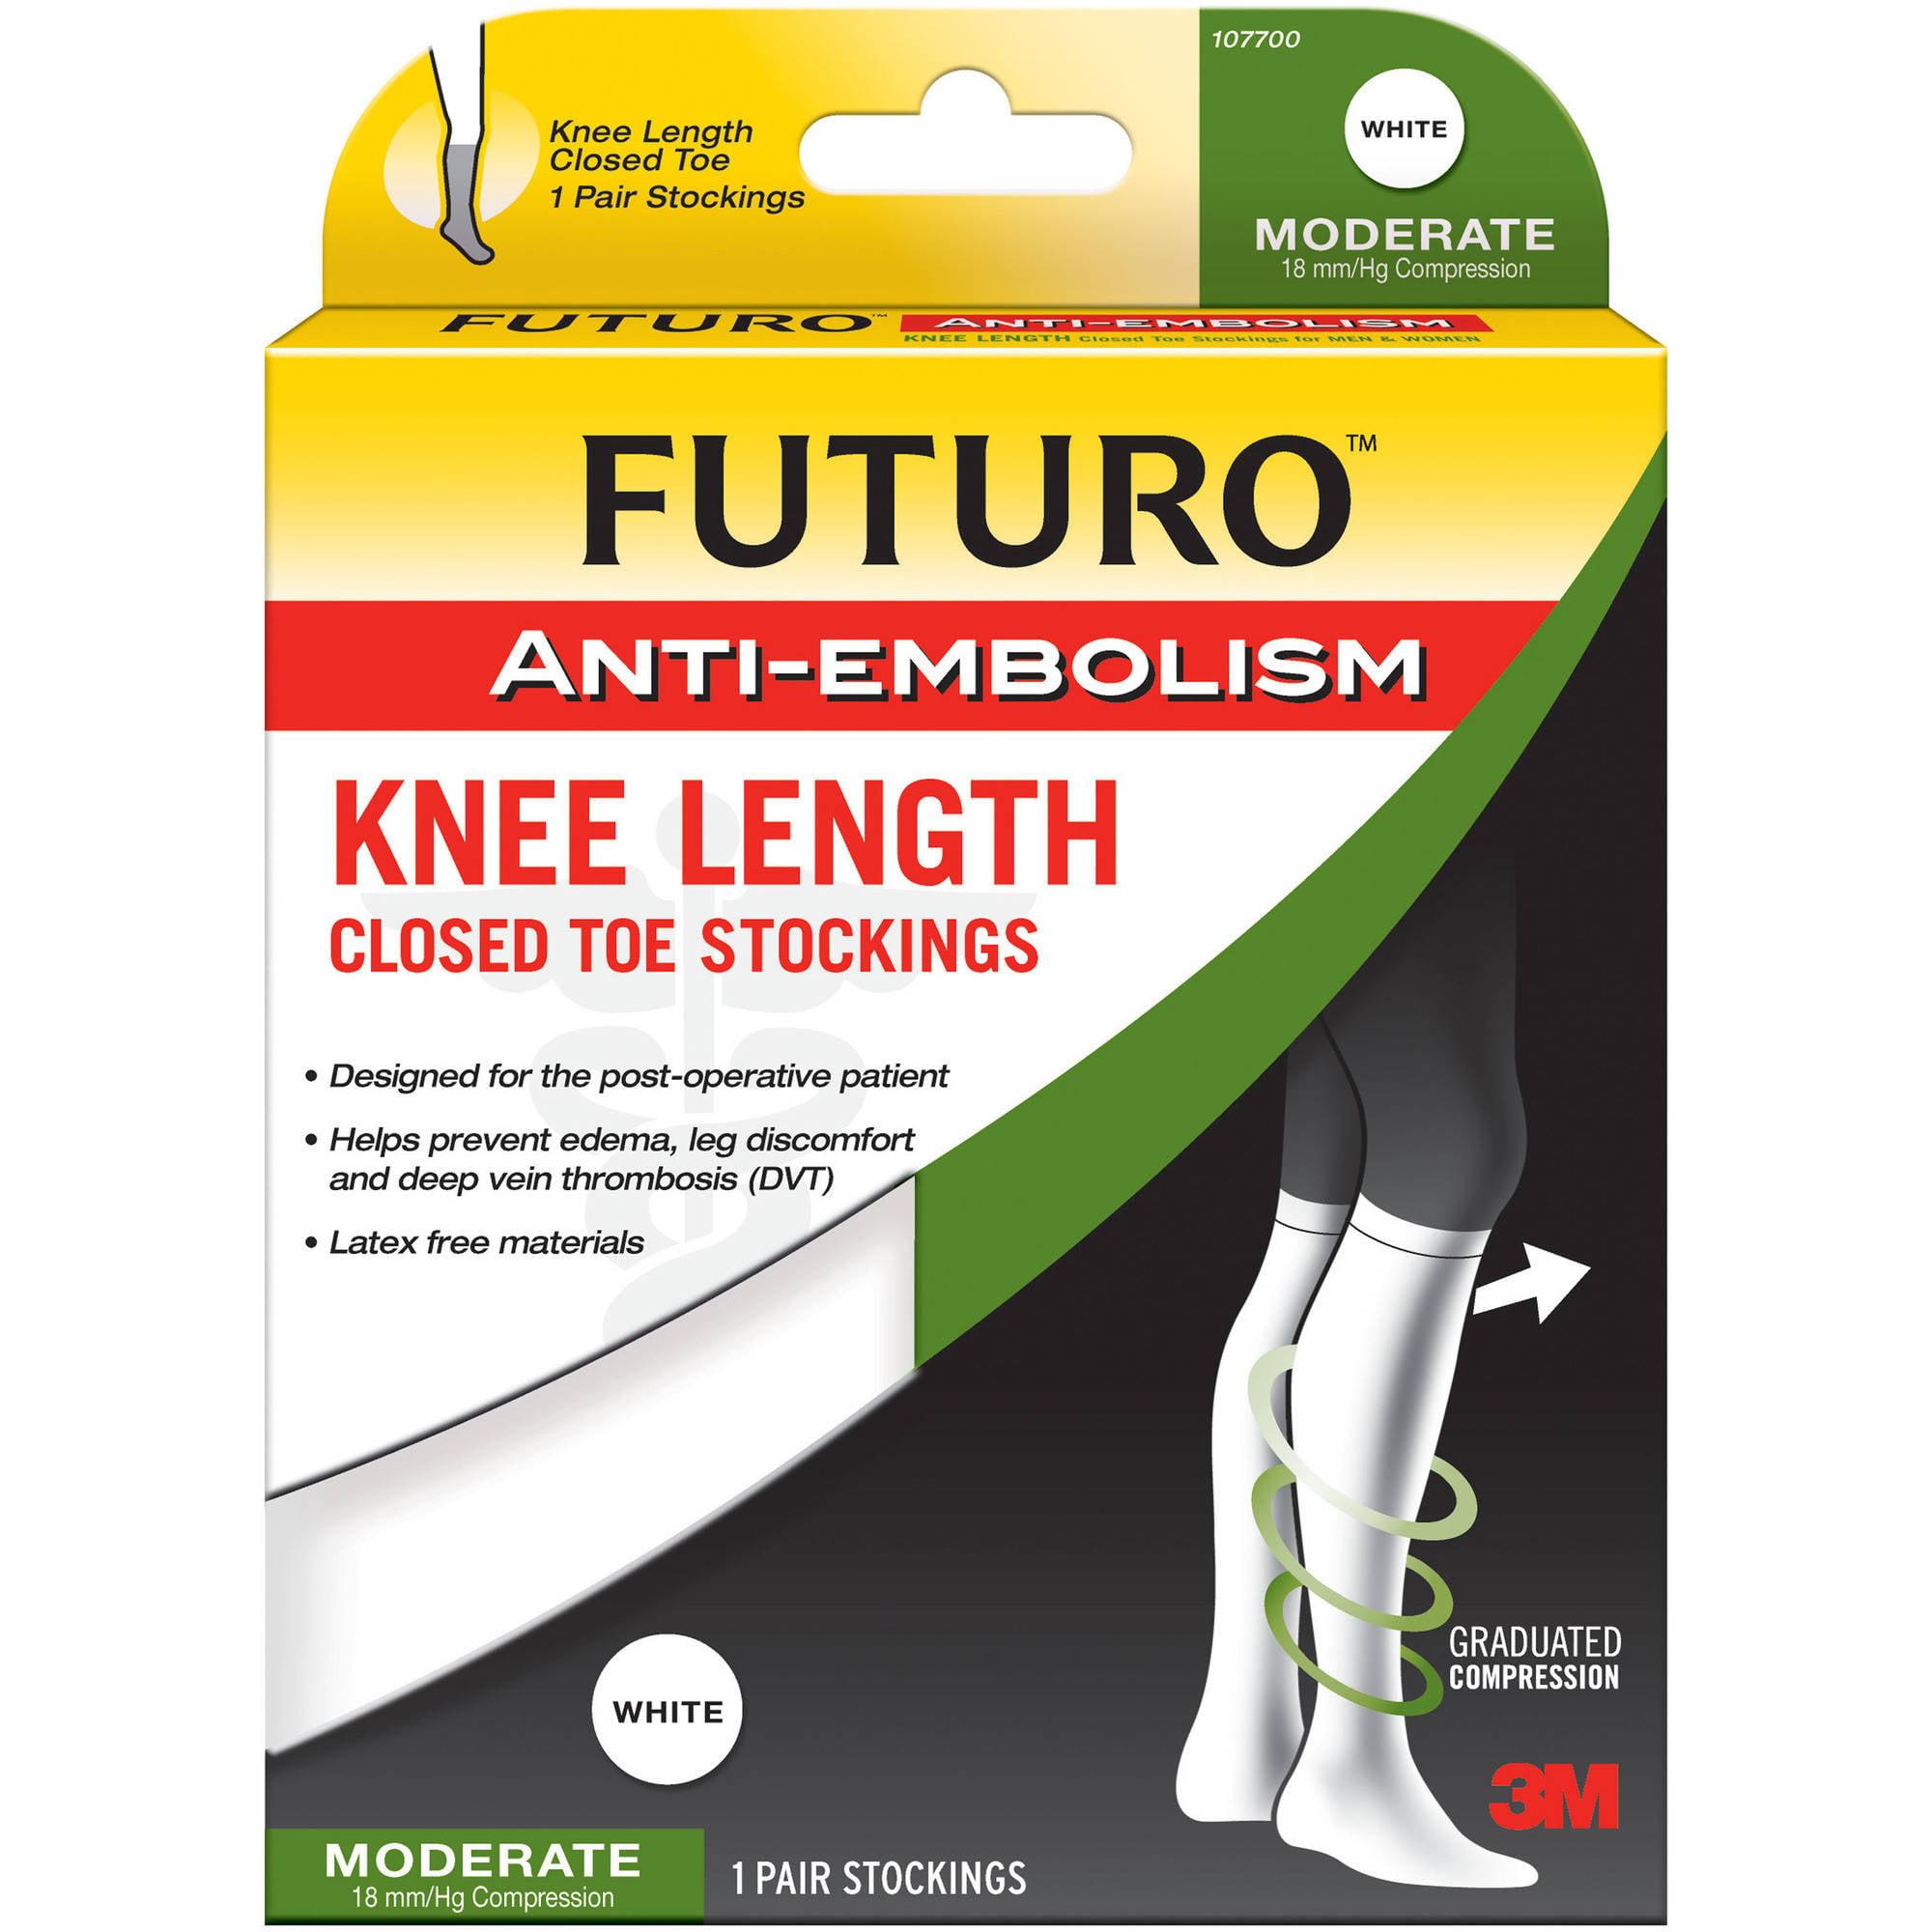 FUTURO Anti-Embolism Stockings, Knee Length, Closed Toe, Medium Regular, White